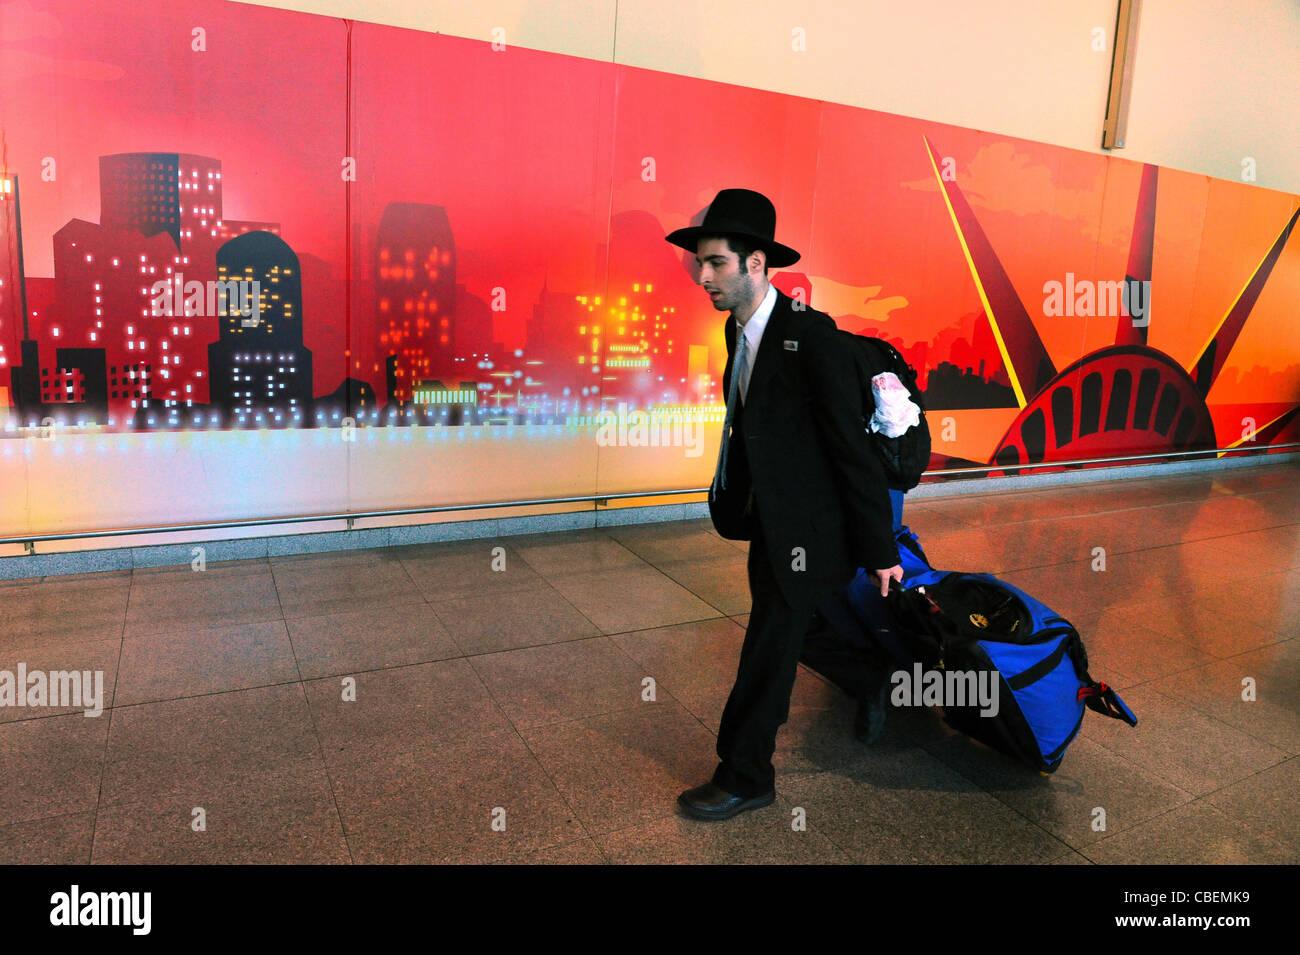 Orthodox Jewish men arriving to New York via J.F.K Airport. Stock Photo